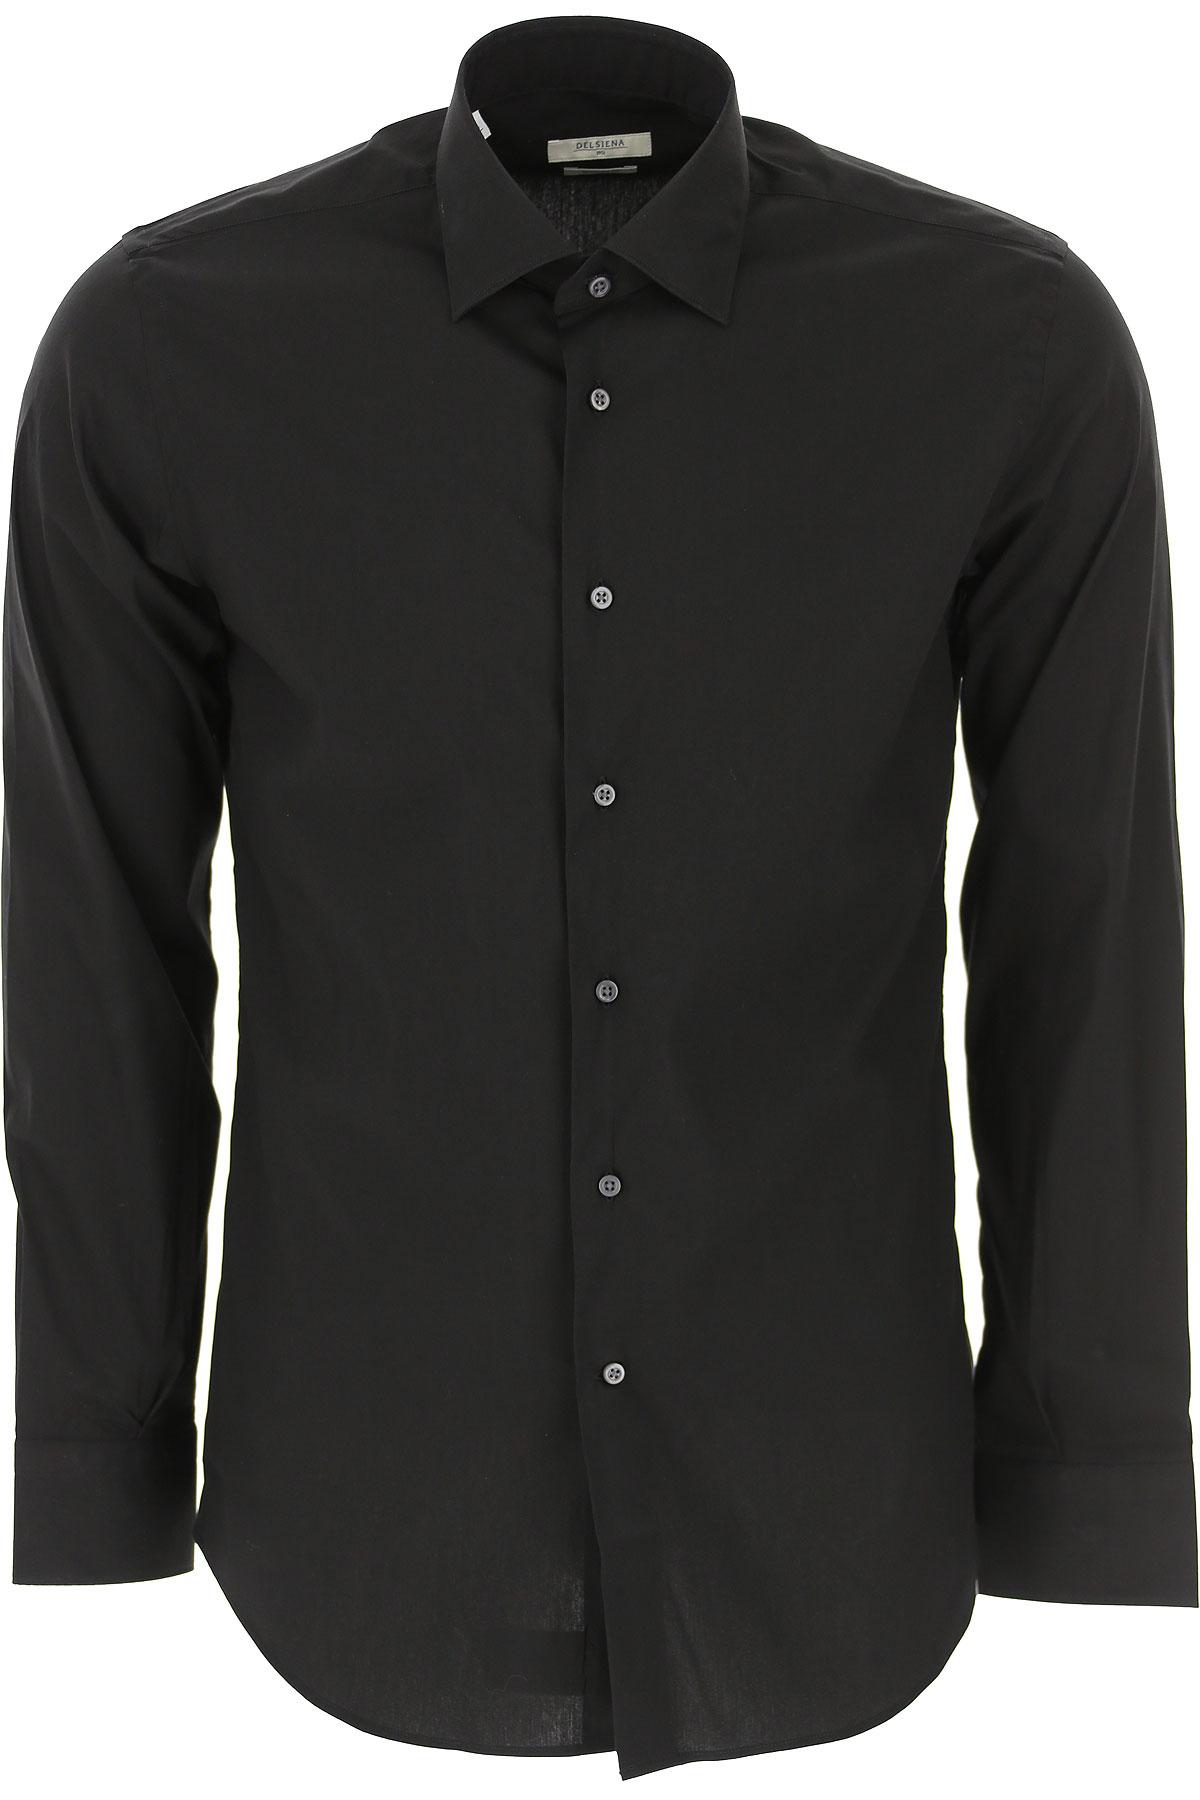 Del Siena Shirt for Men On Sale, Black, Cotton, 2019, 15.5 16